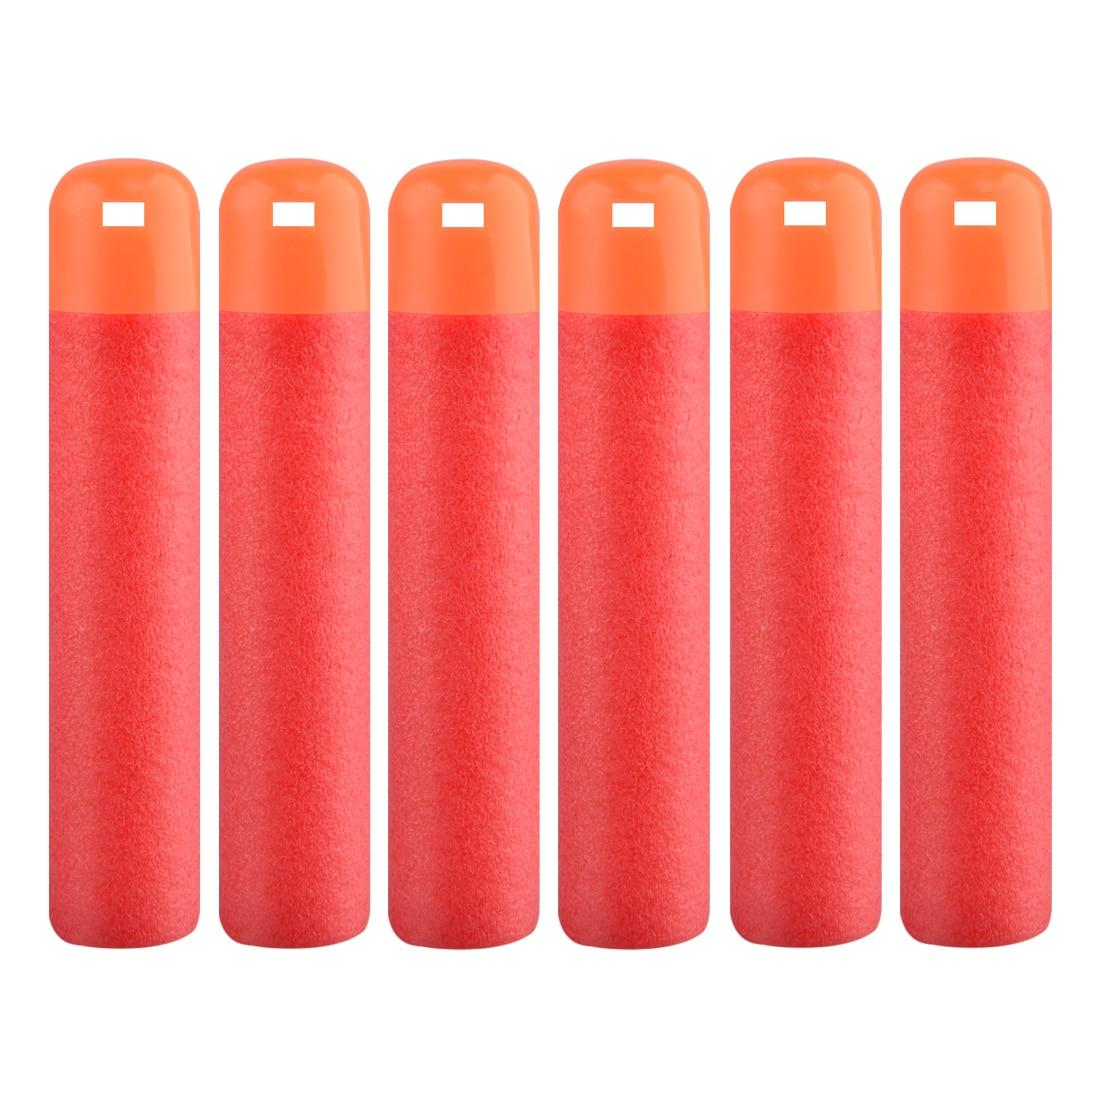 30Pcs/Lot 9.5cm Red Sniper Rifle Darts Christmas Gift Bullets For Nerf Mega Kids Toy Foam Refill Darts Big Hole Head Bullets